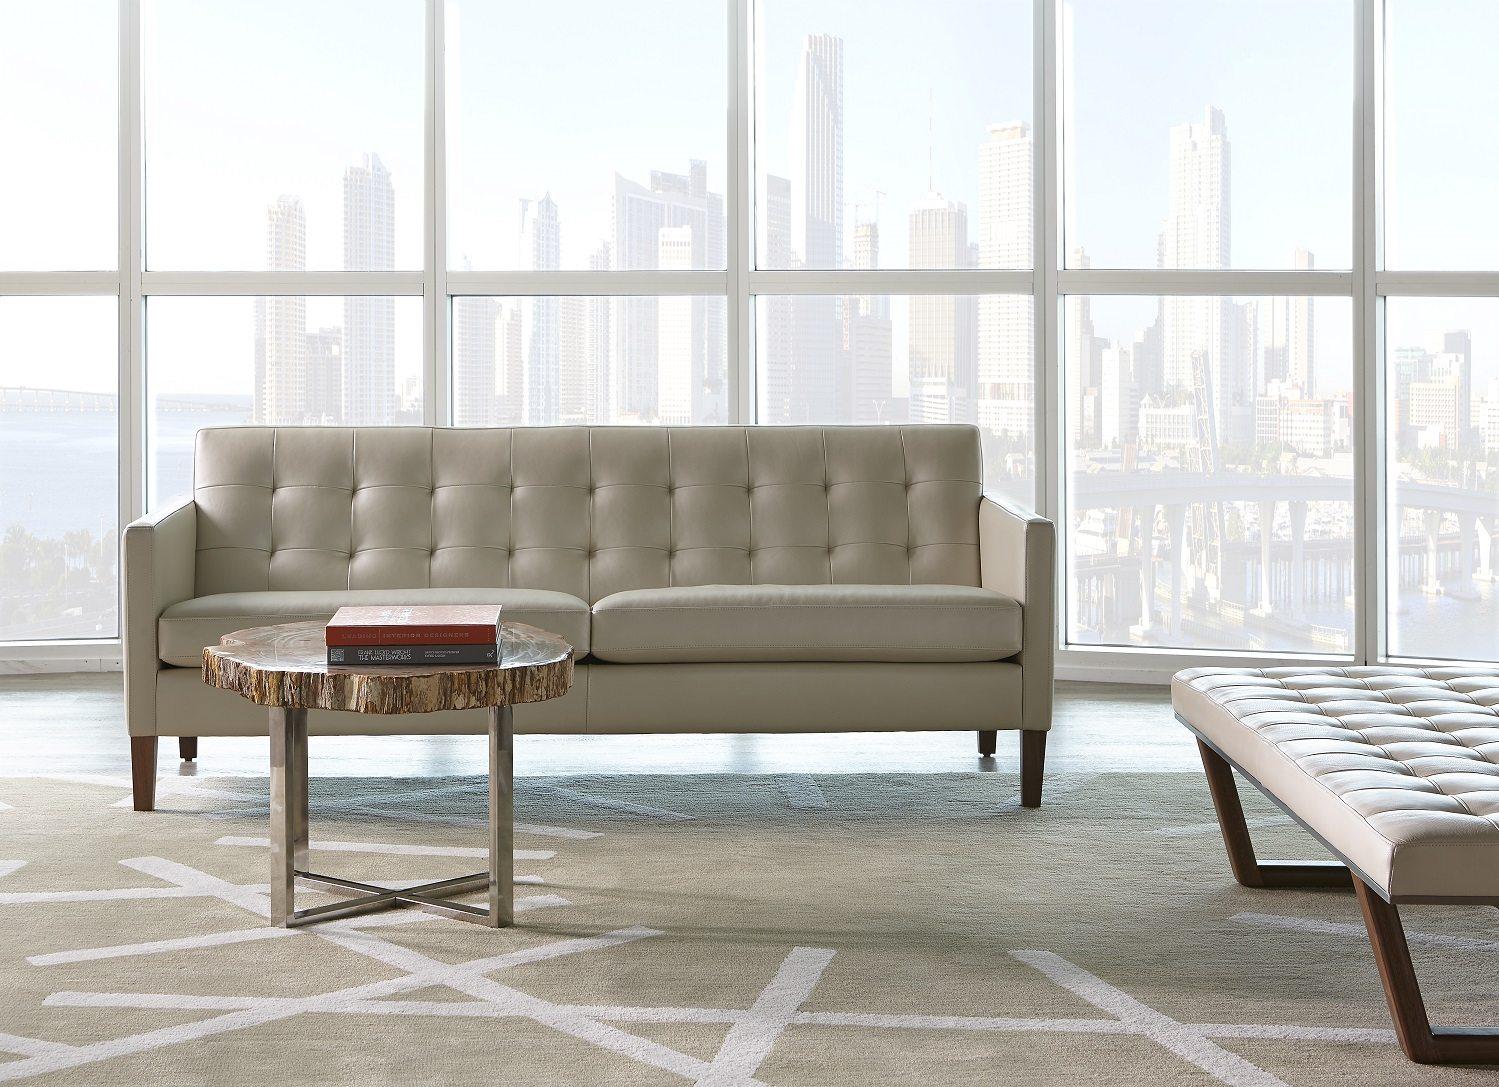 ainsley-sofa-edison-reduced